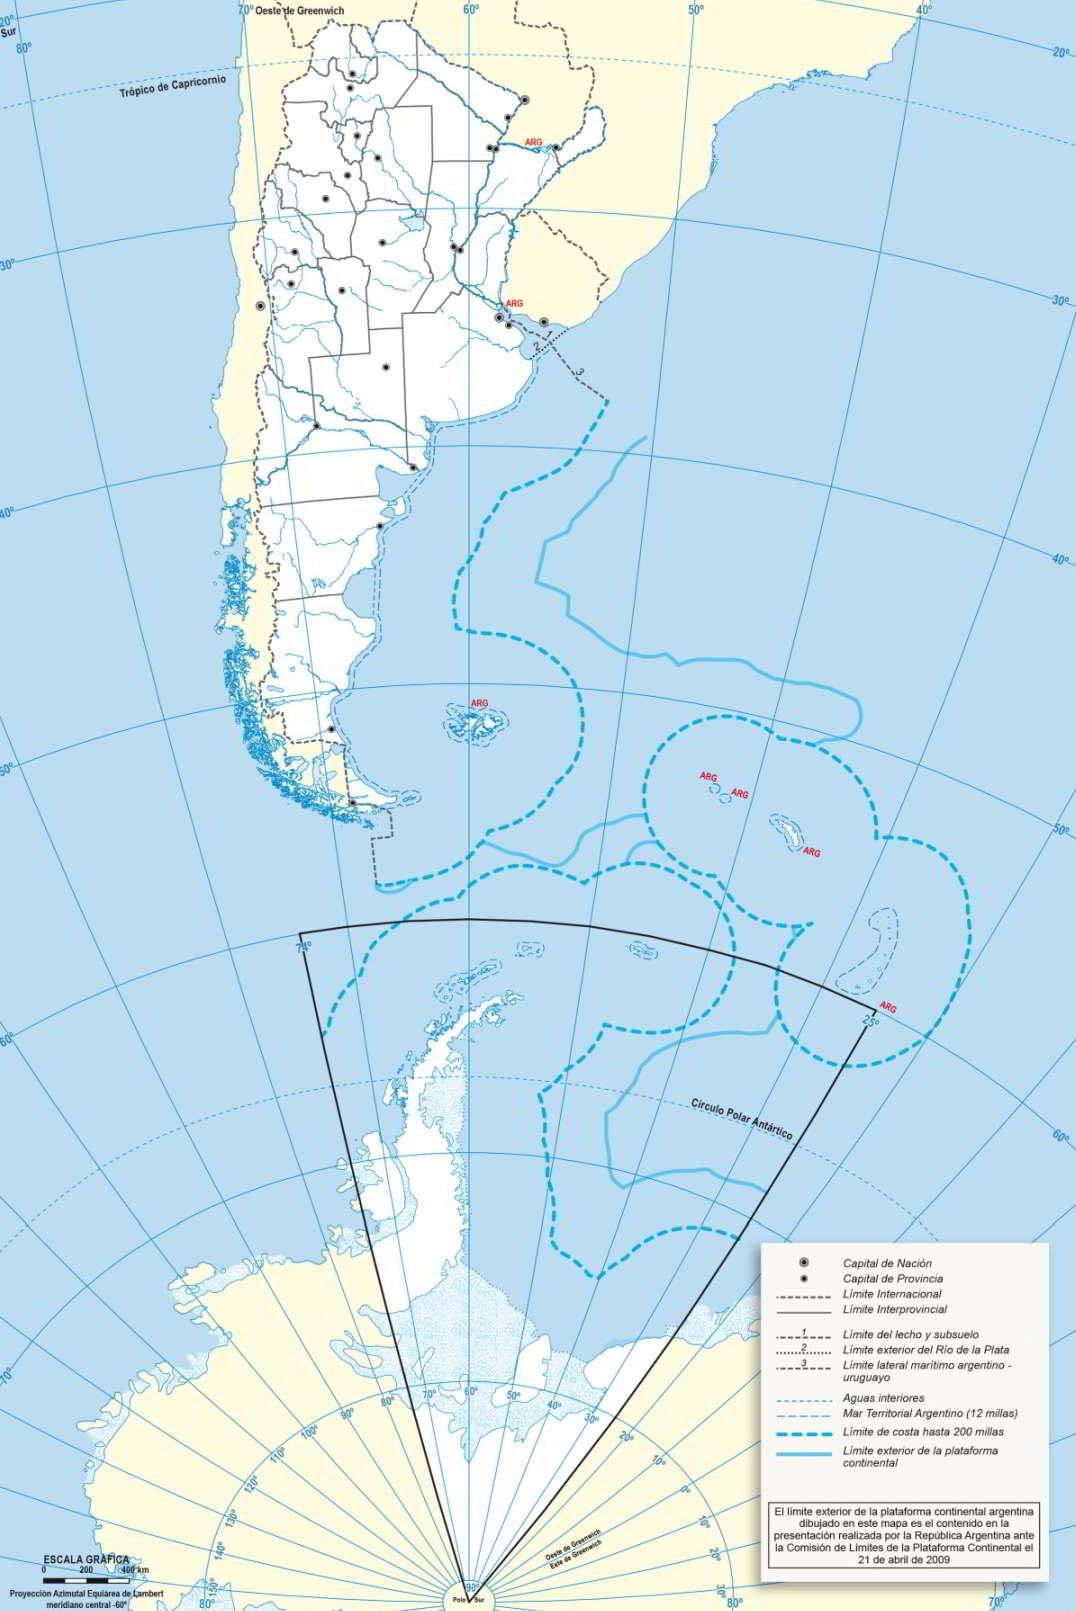 Superficie de Argentina Mapa politico